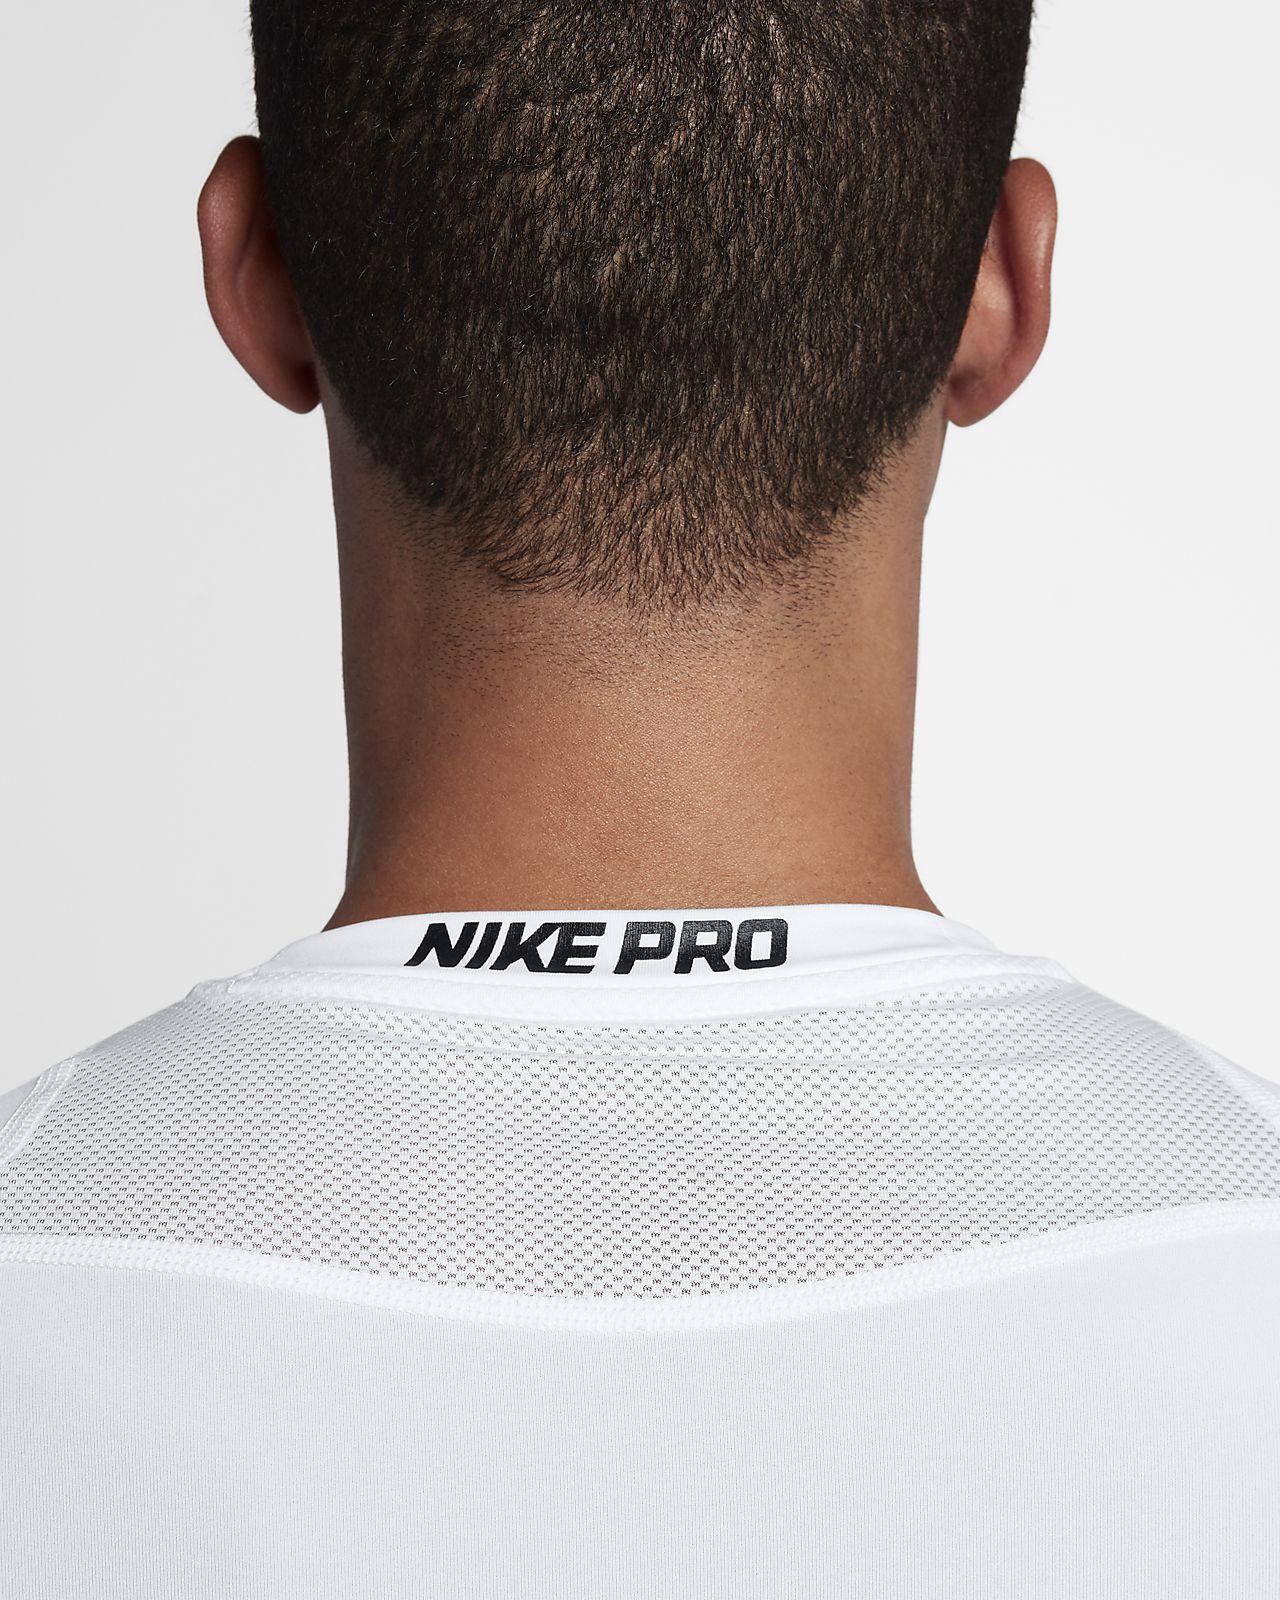 5b97b038dfce6 NIKE公式】ナイキ プロ メンズ ショートスリーブ トレーニングトップ ...